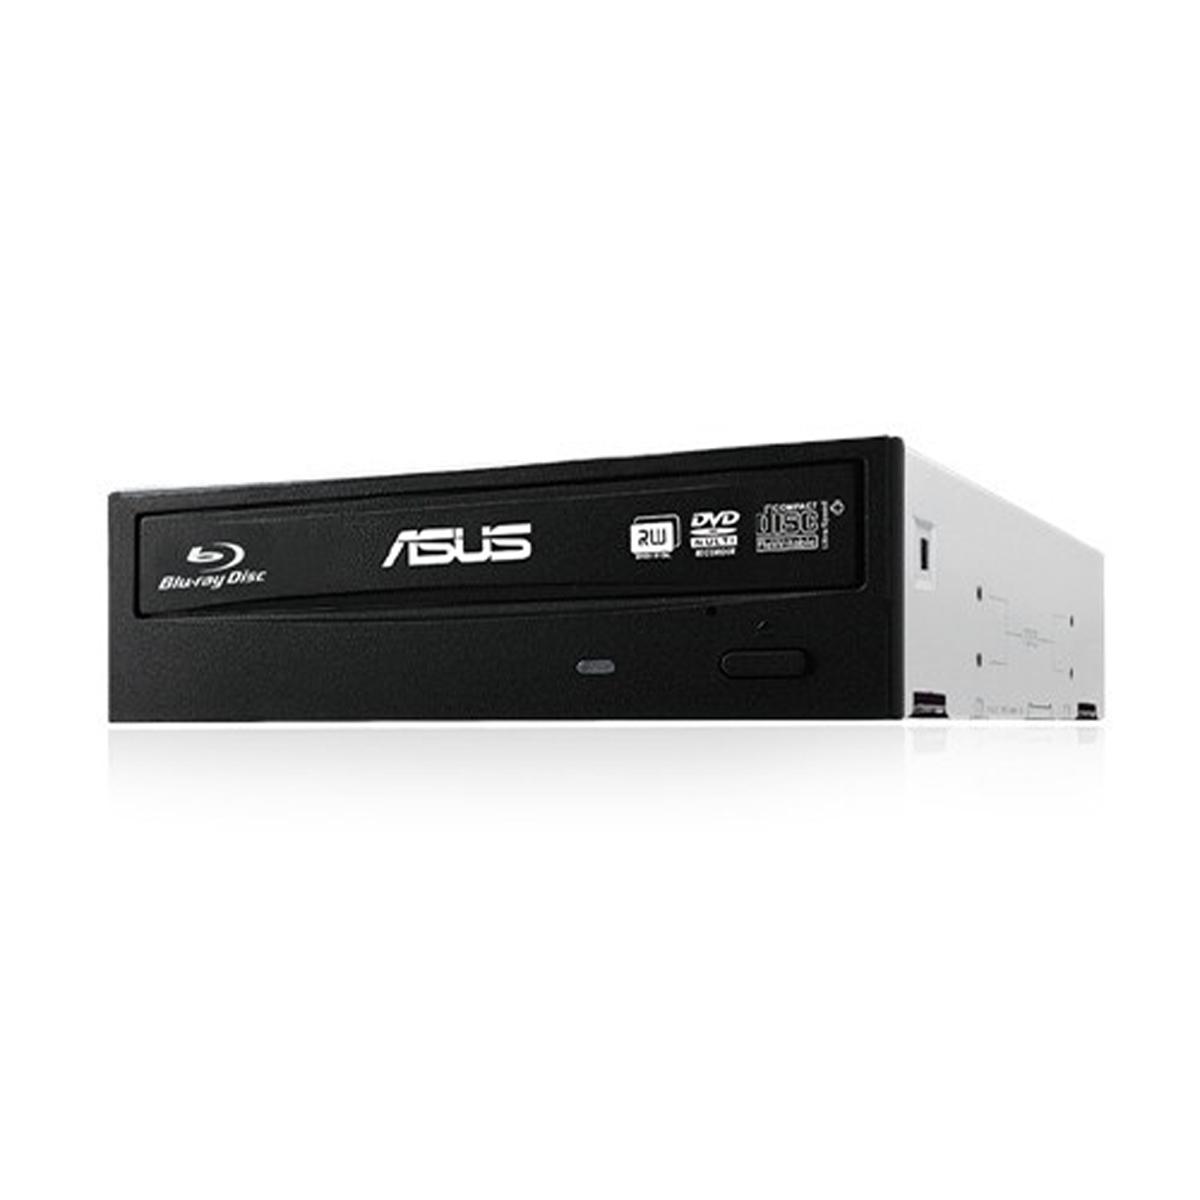 Blue-Ray DVD-RW Brenner BD BDXL CD Laufwerk intern SATA Asus BW-16D1HT 16-Fach